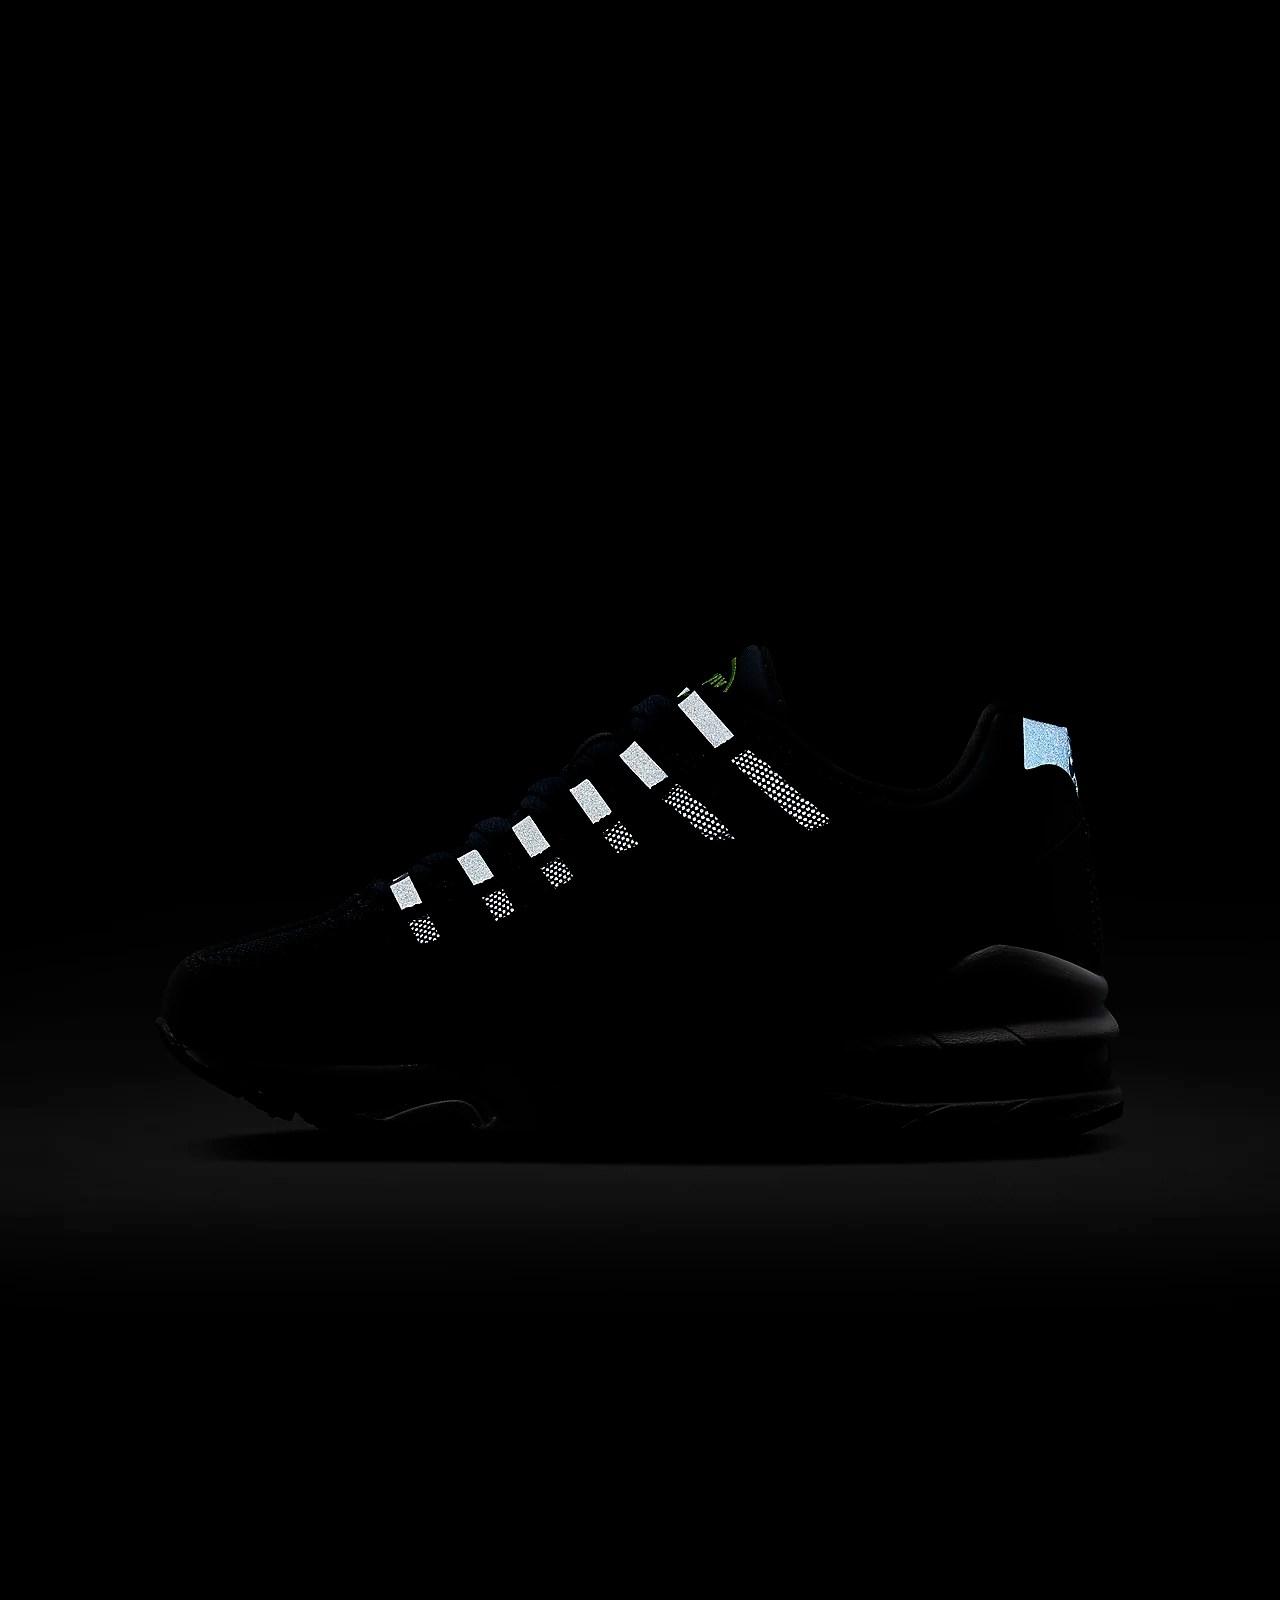 chaussure nike air max 95 pour enfant plus age